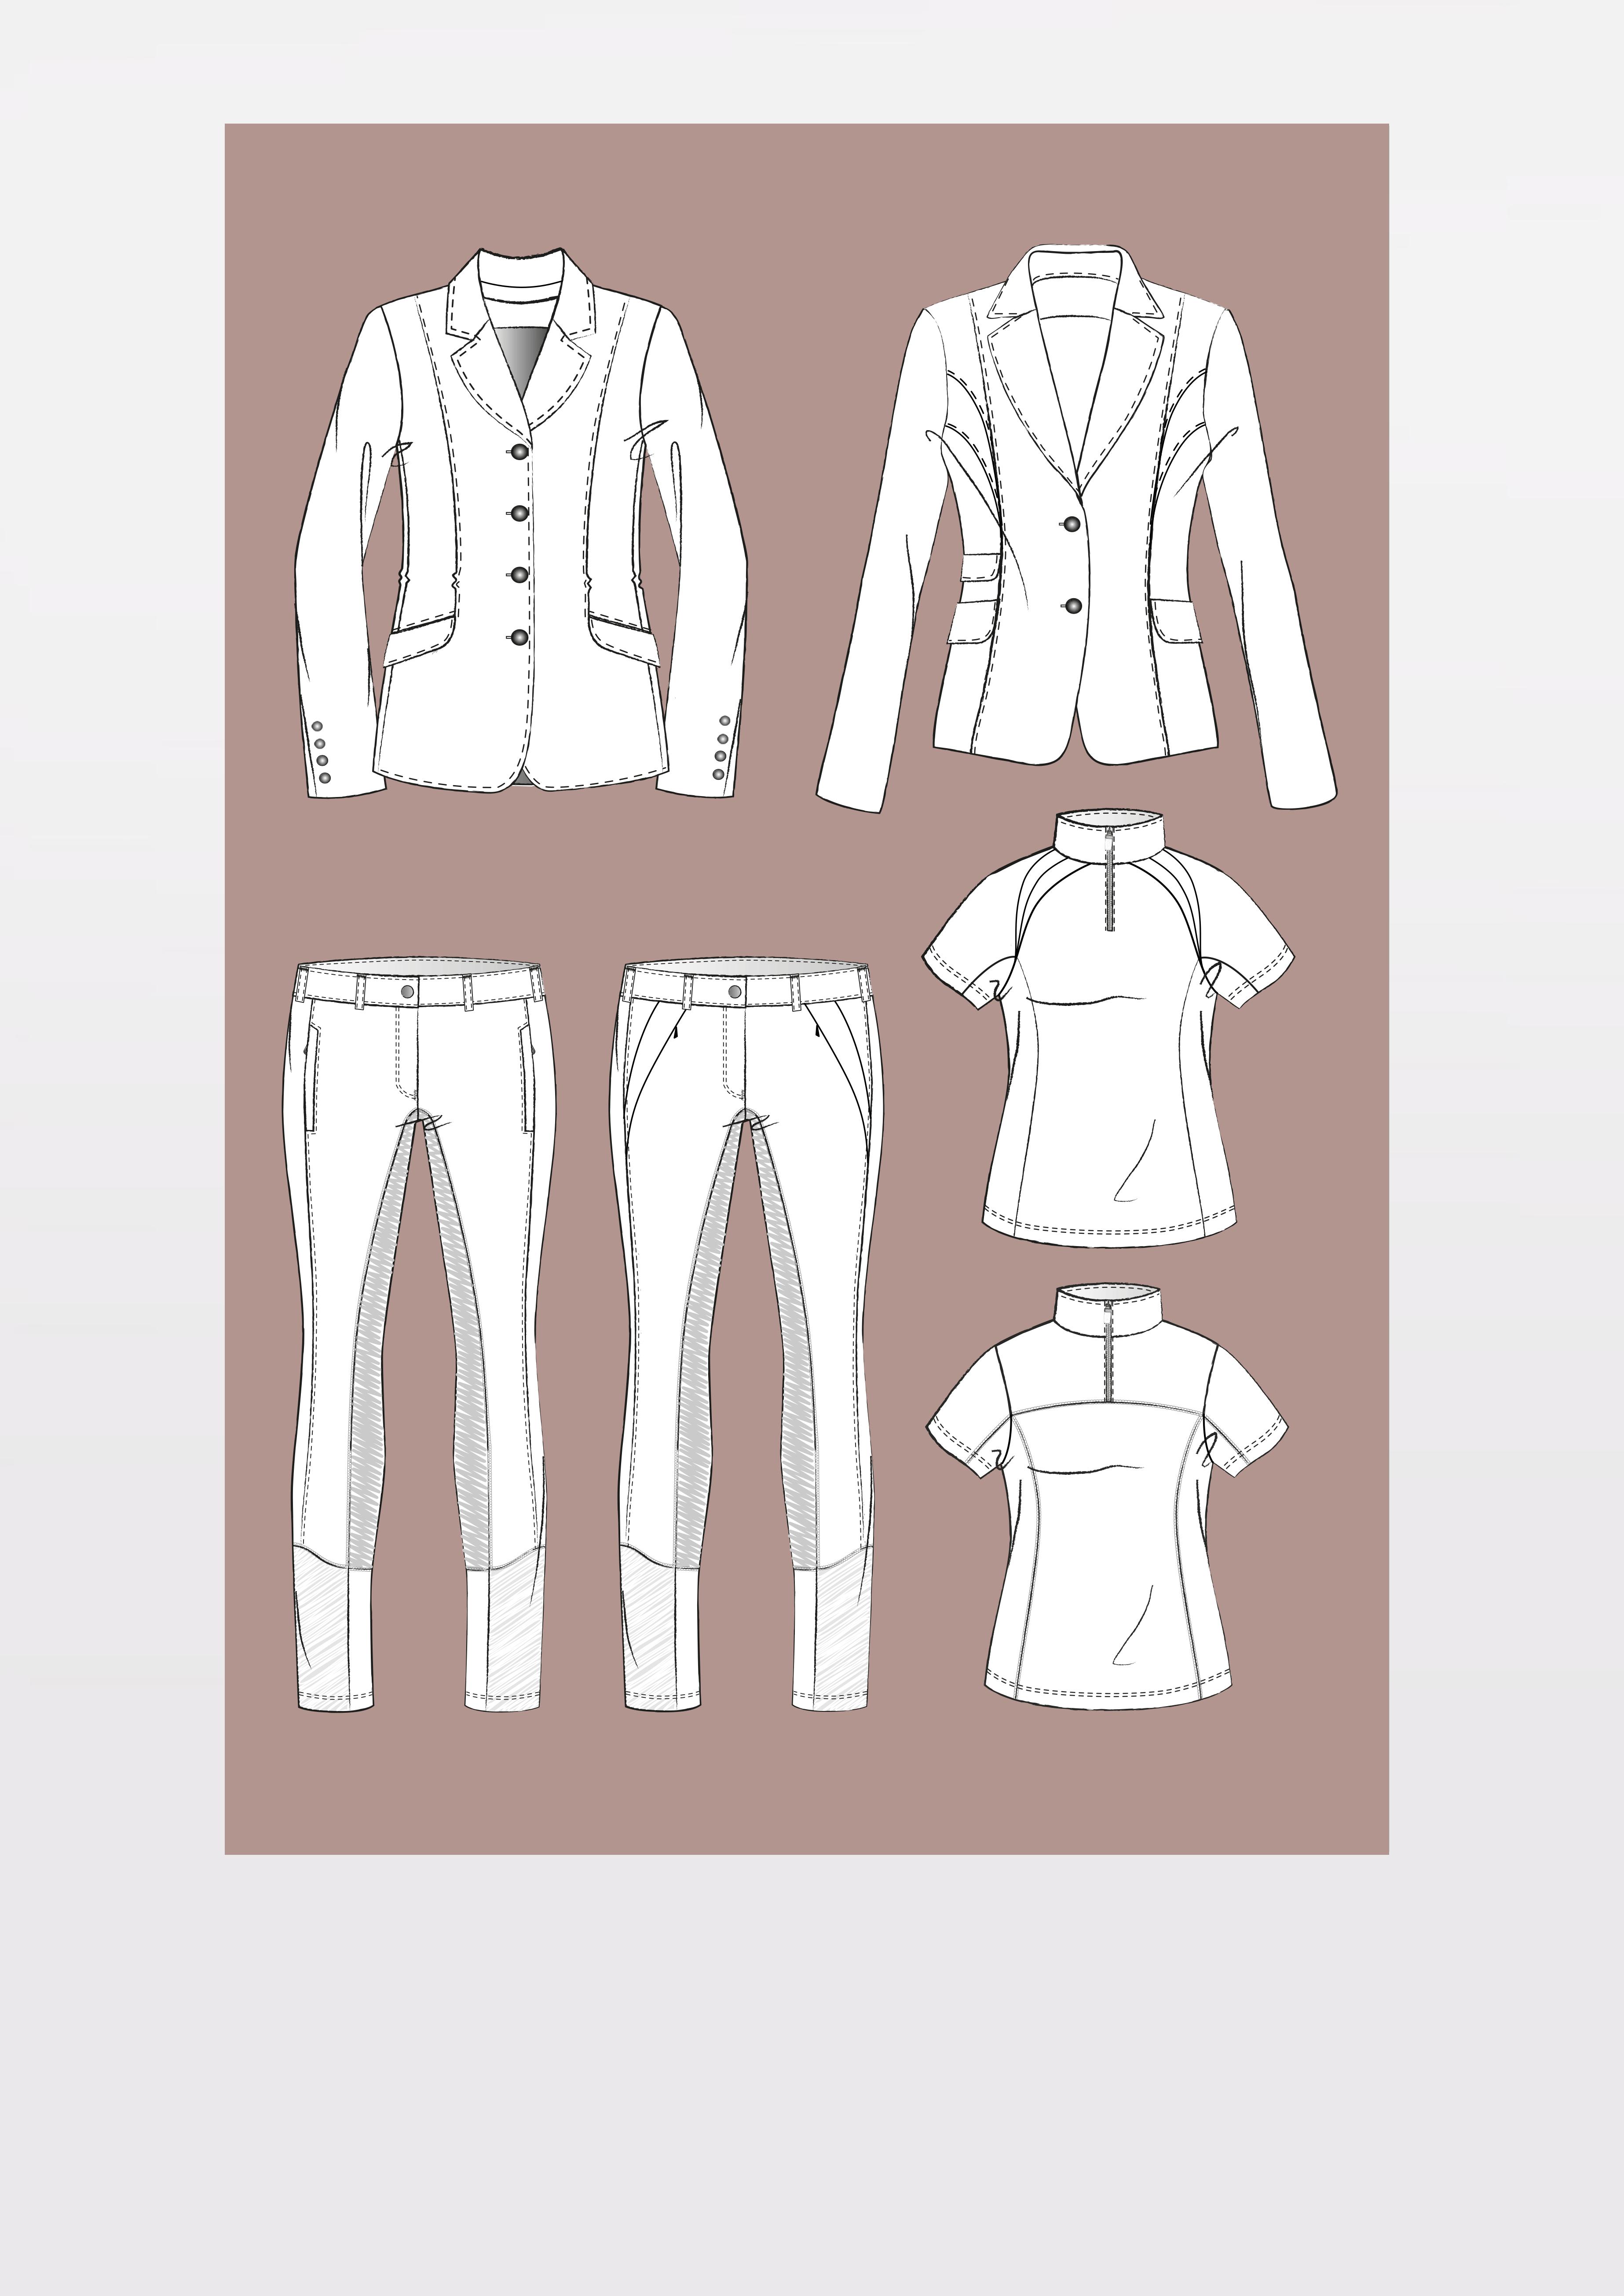 Produkt: Schnitt-Technik Reitbekleidung – Teil 1